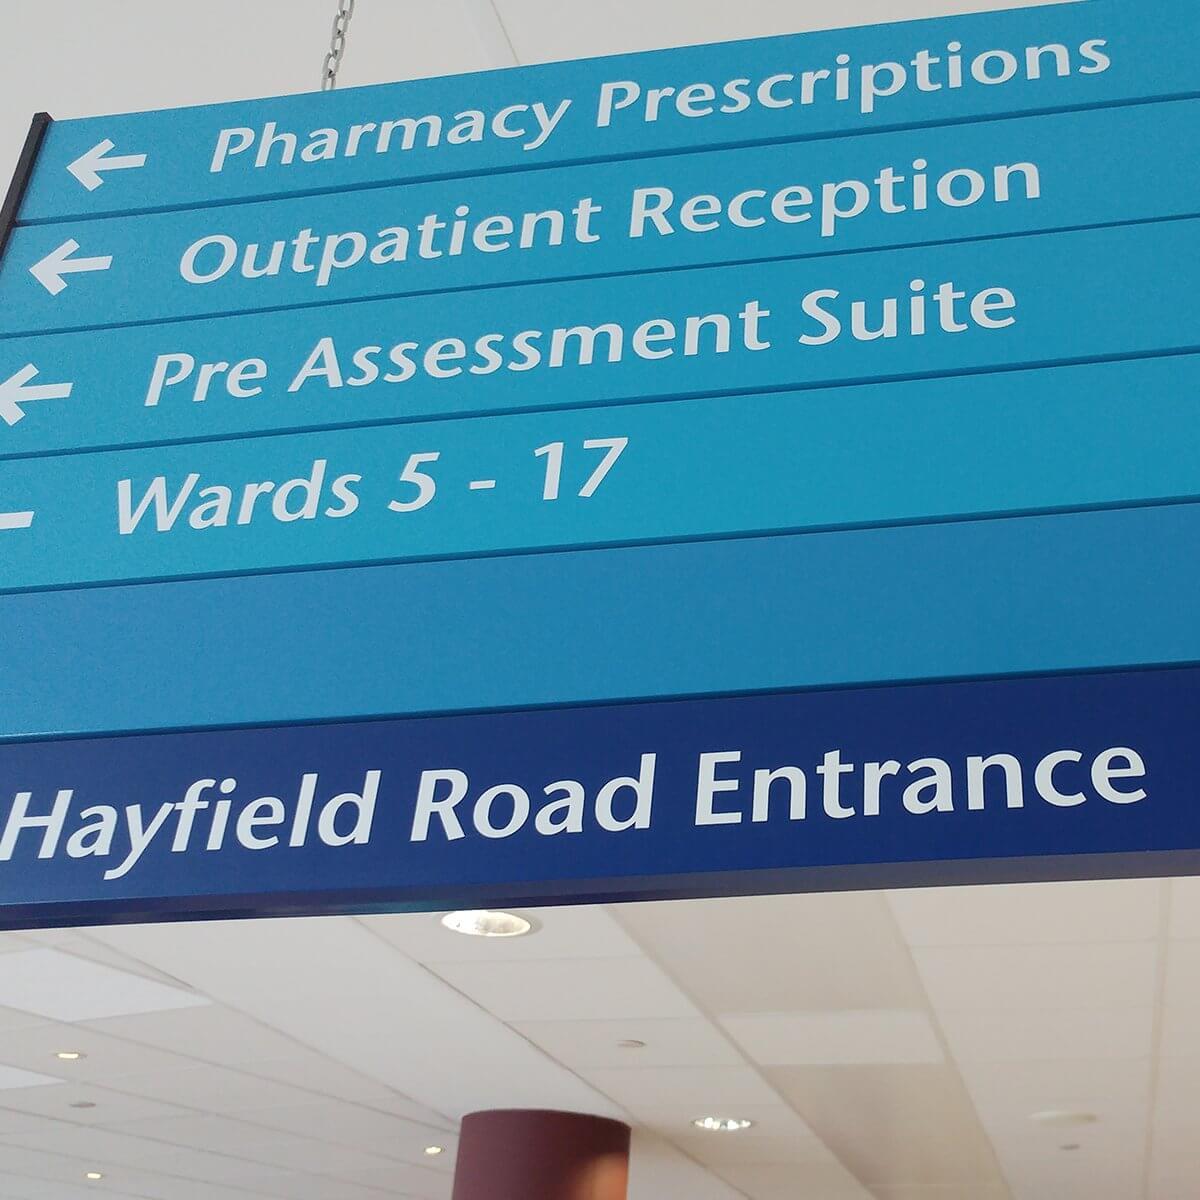 Design & Signage, Printed Displays, Hospital Signs